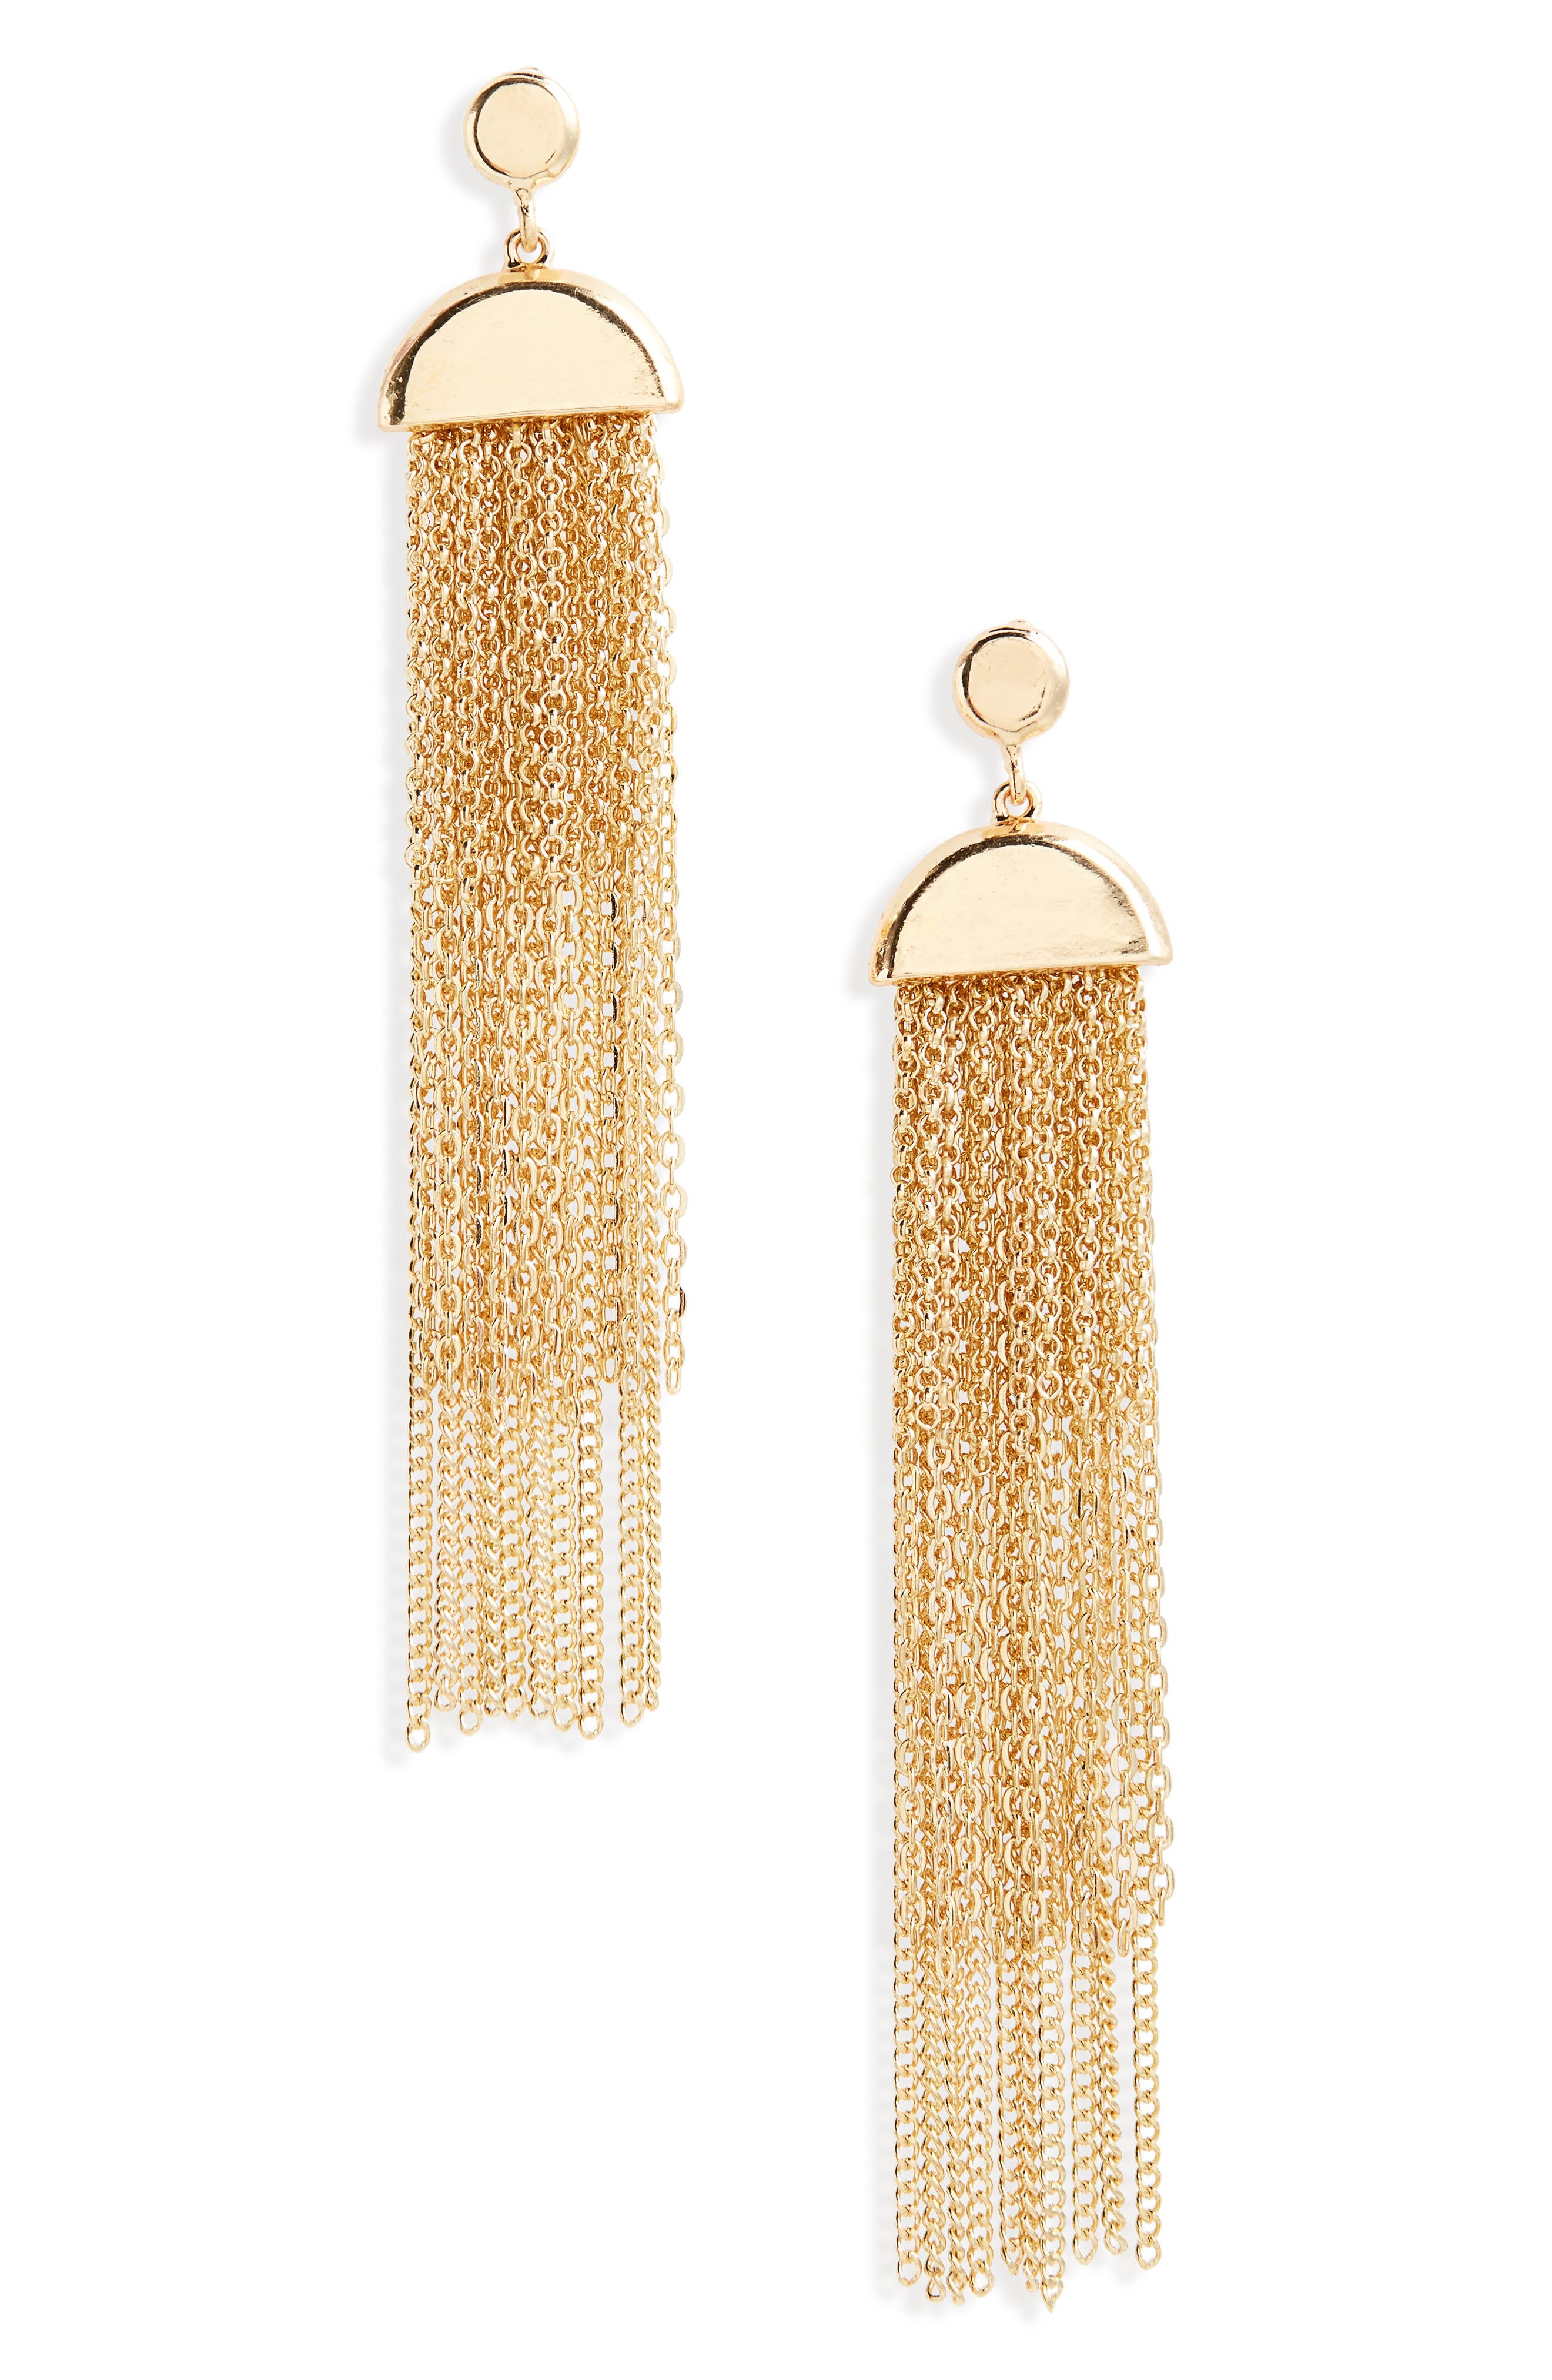 Chain Fringe Drop Earrings,                             Main thumbnail 1, color,                             710